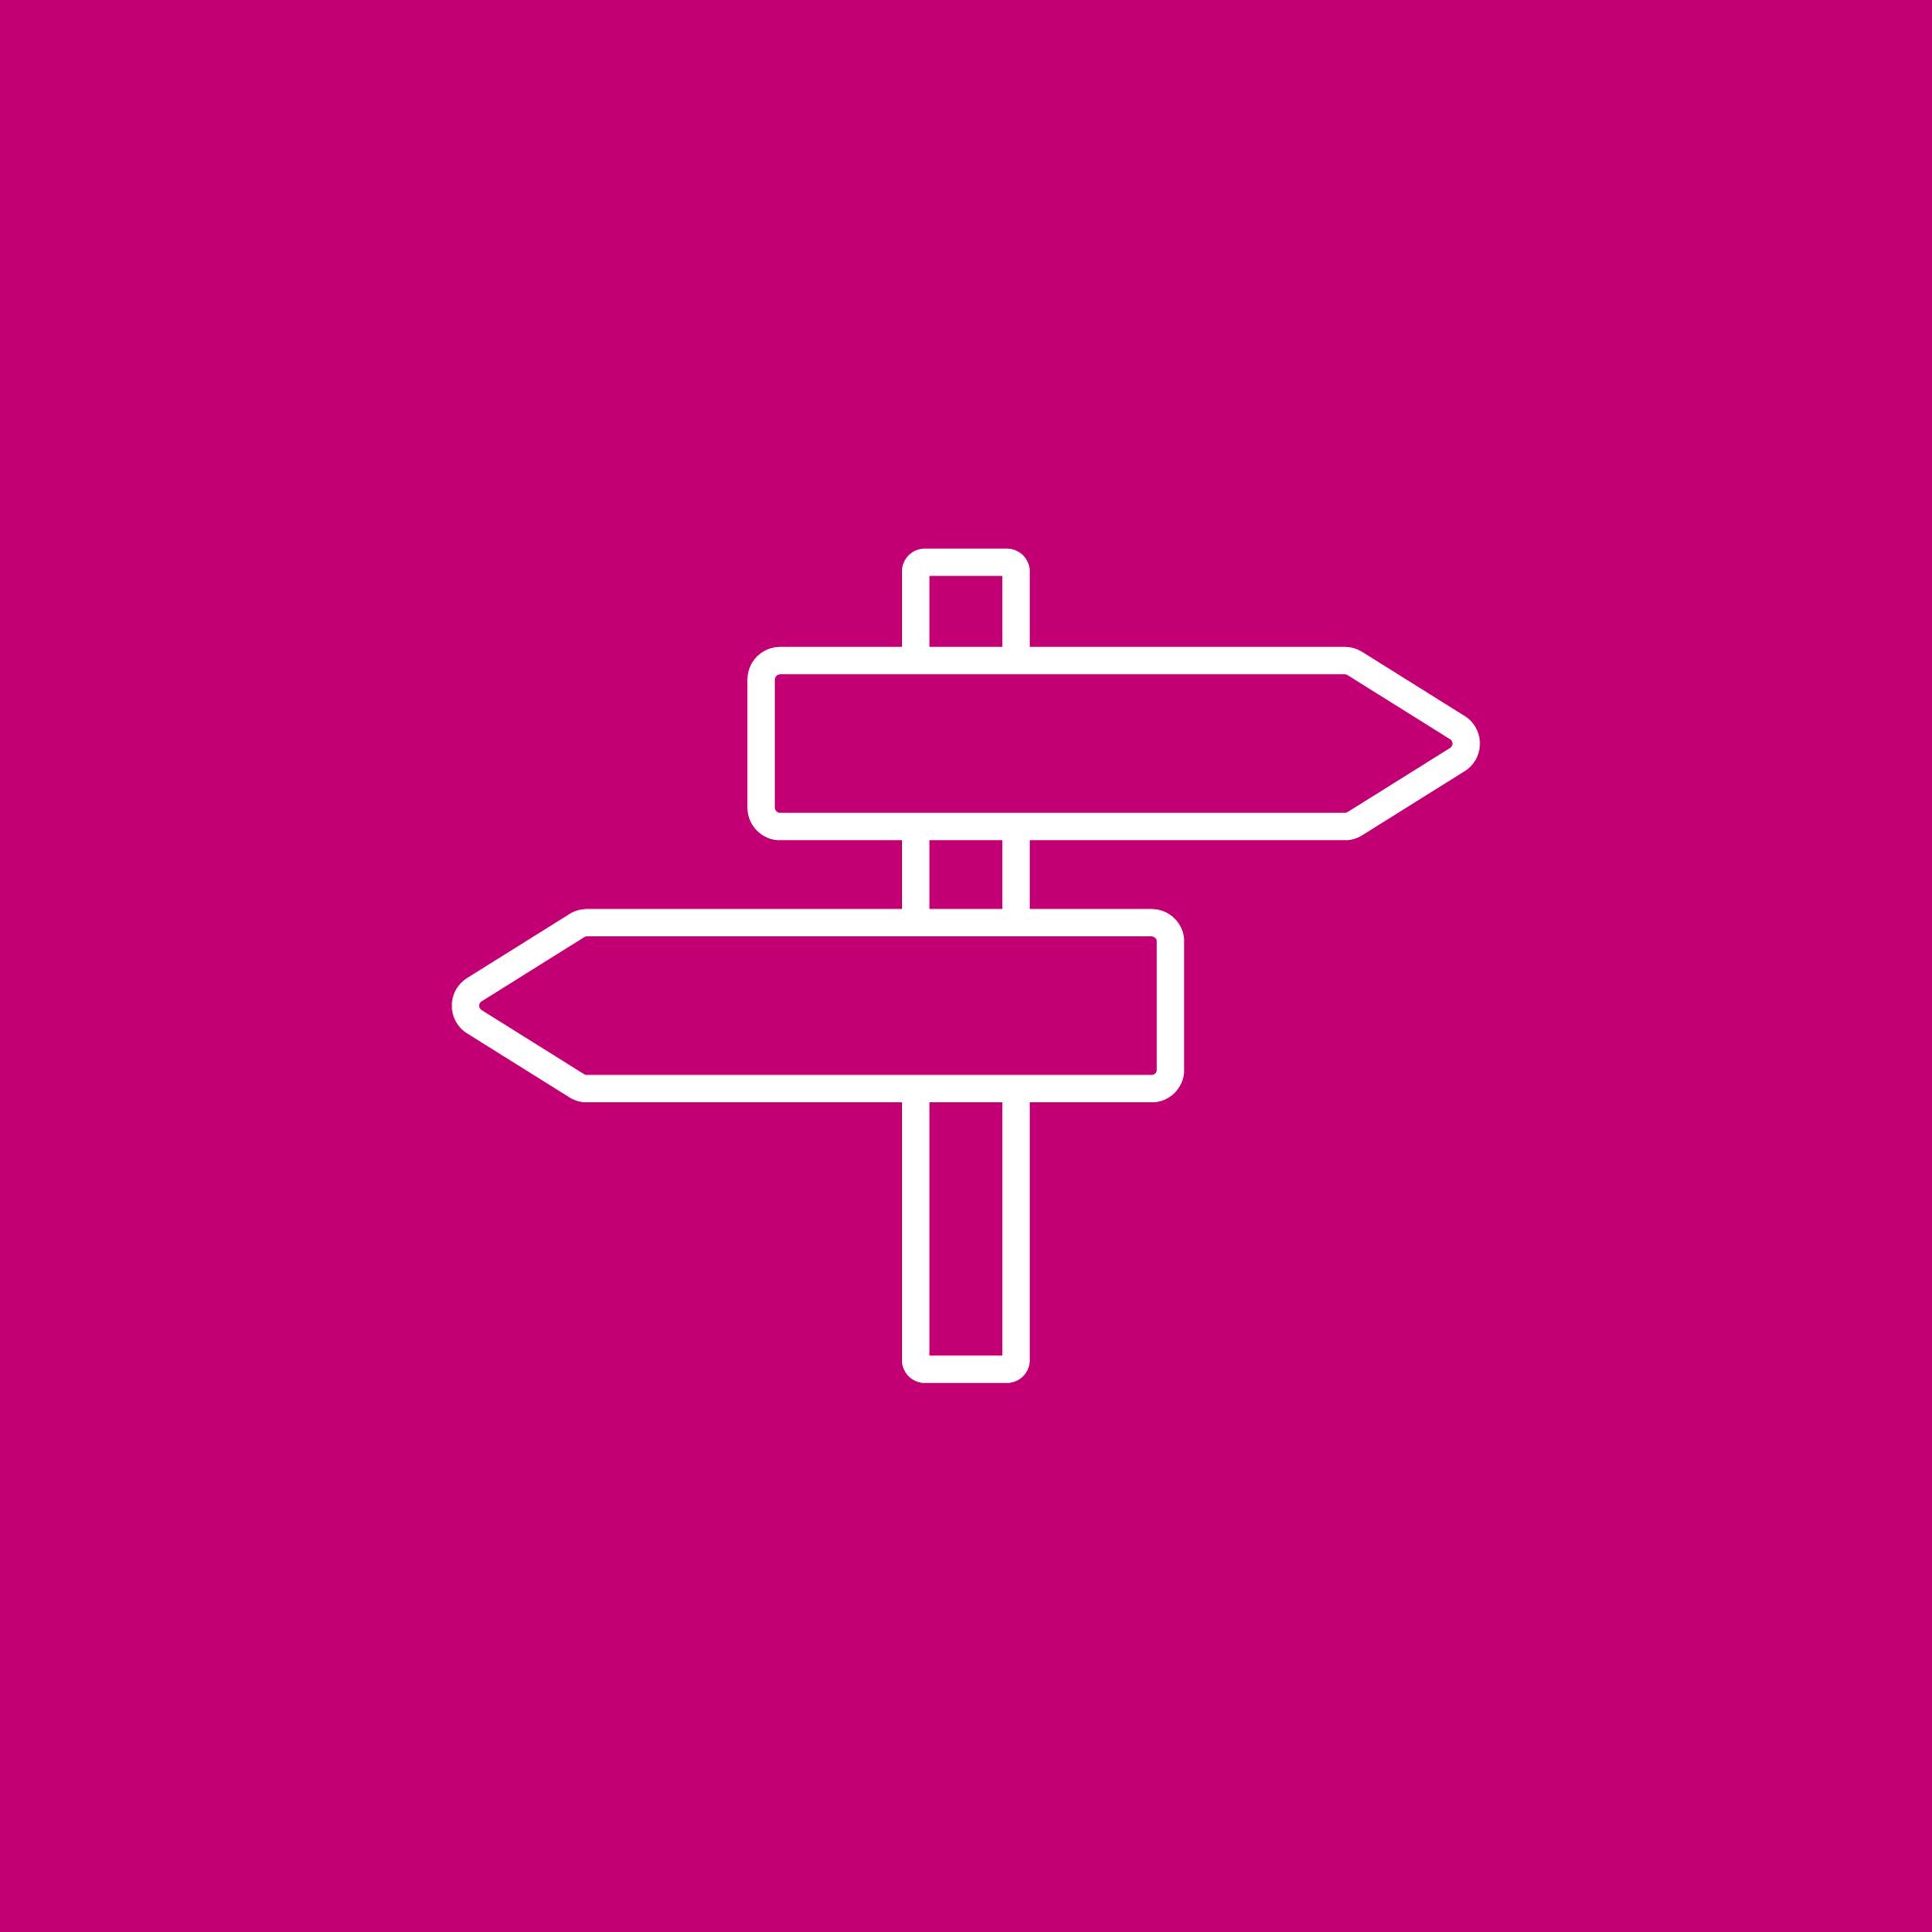 Business signage design & printing   Perth WA